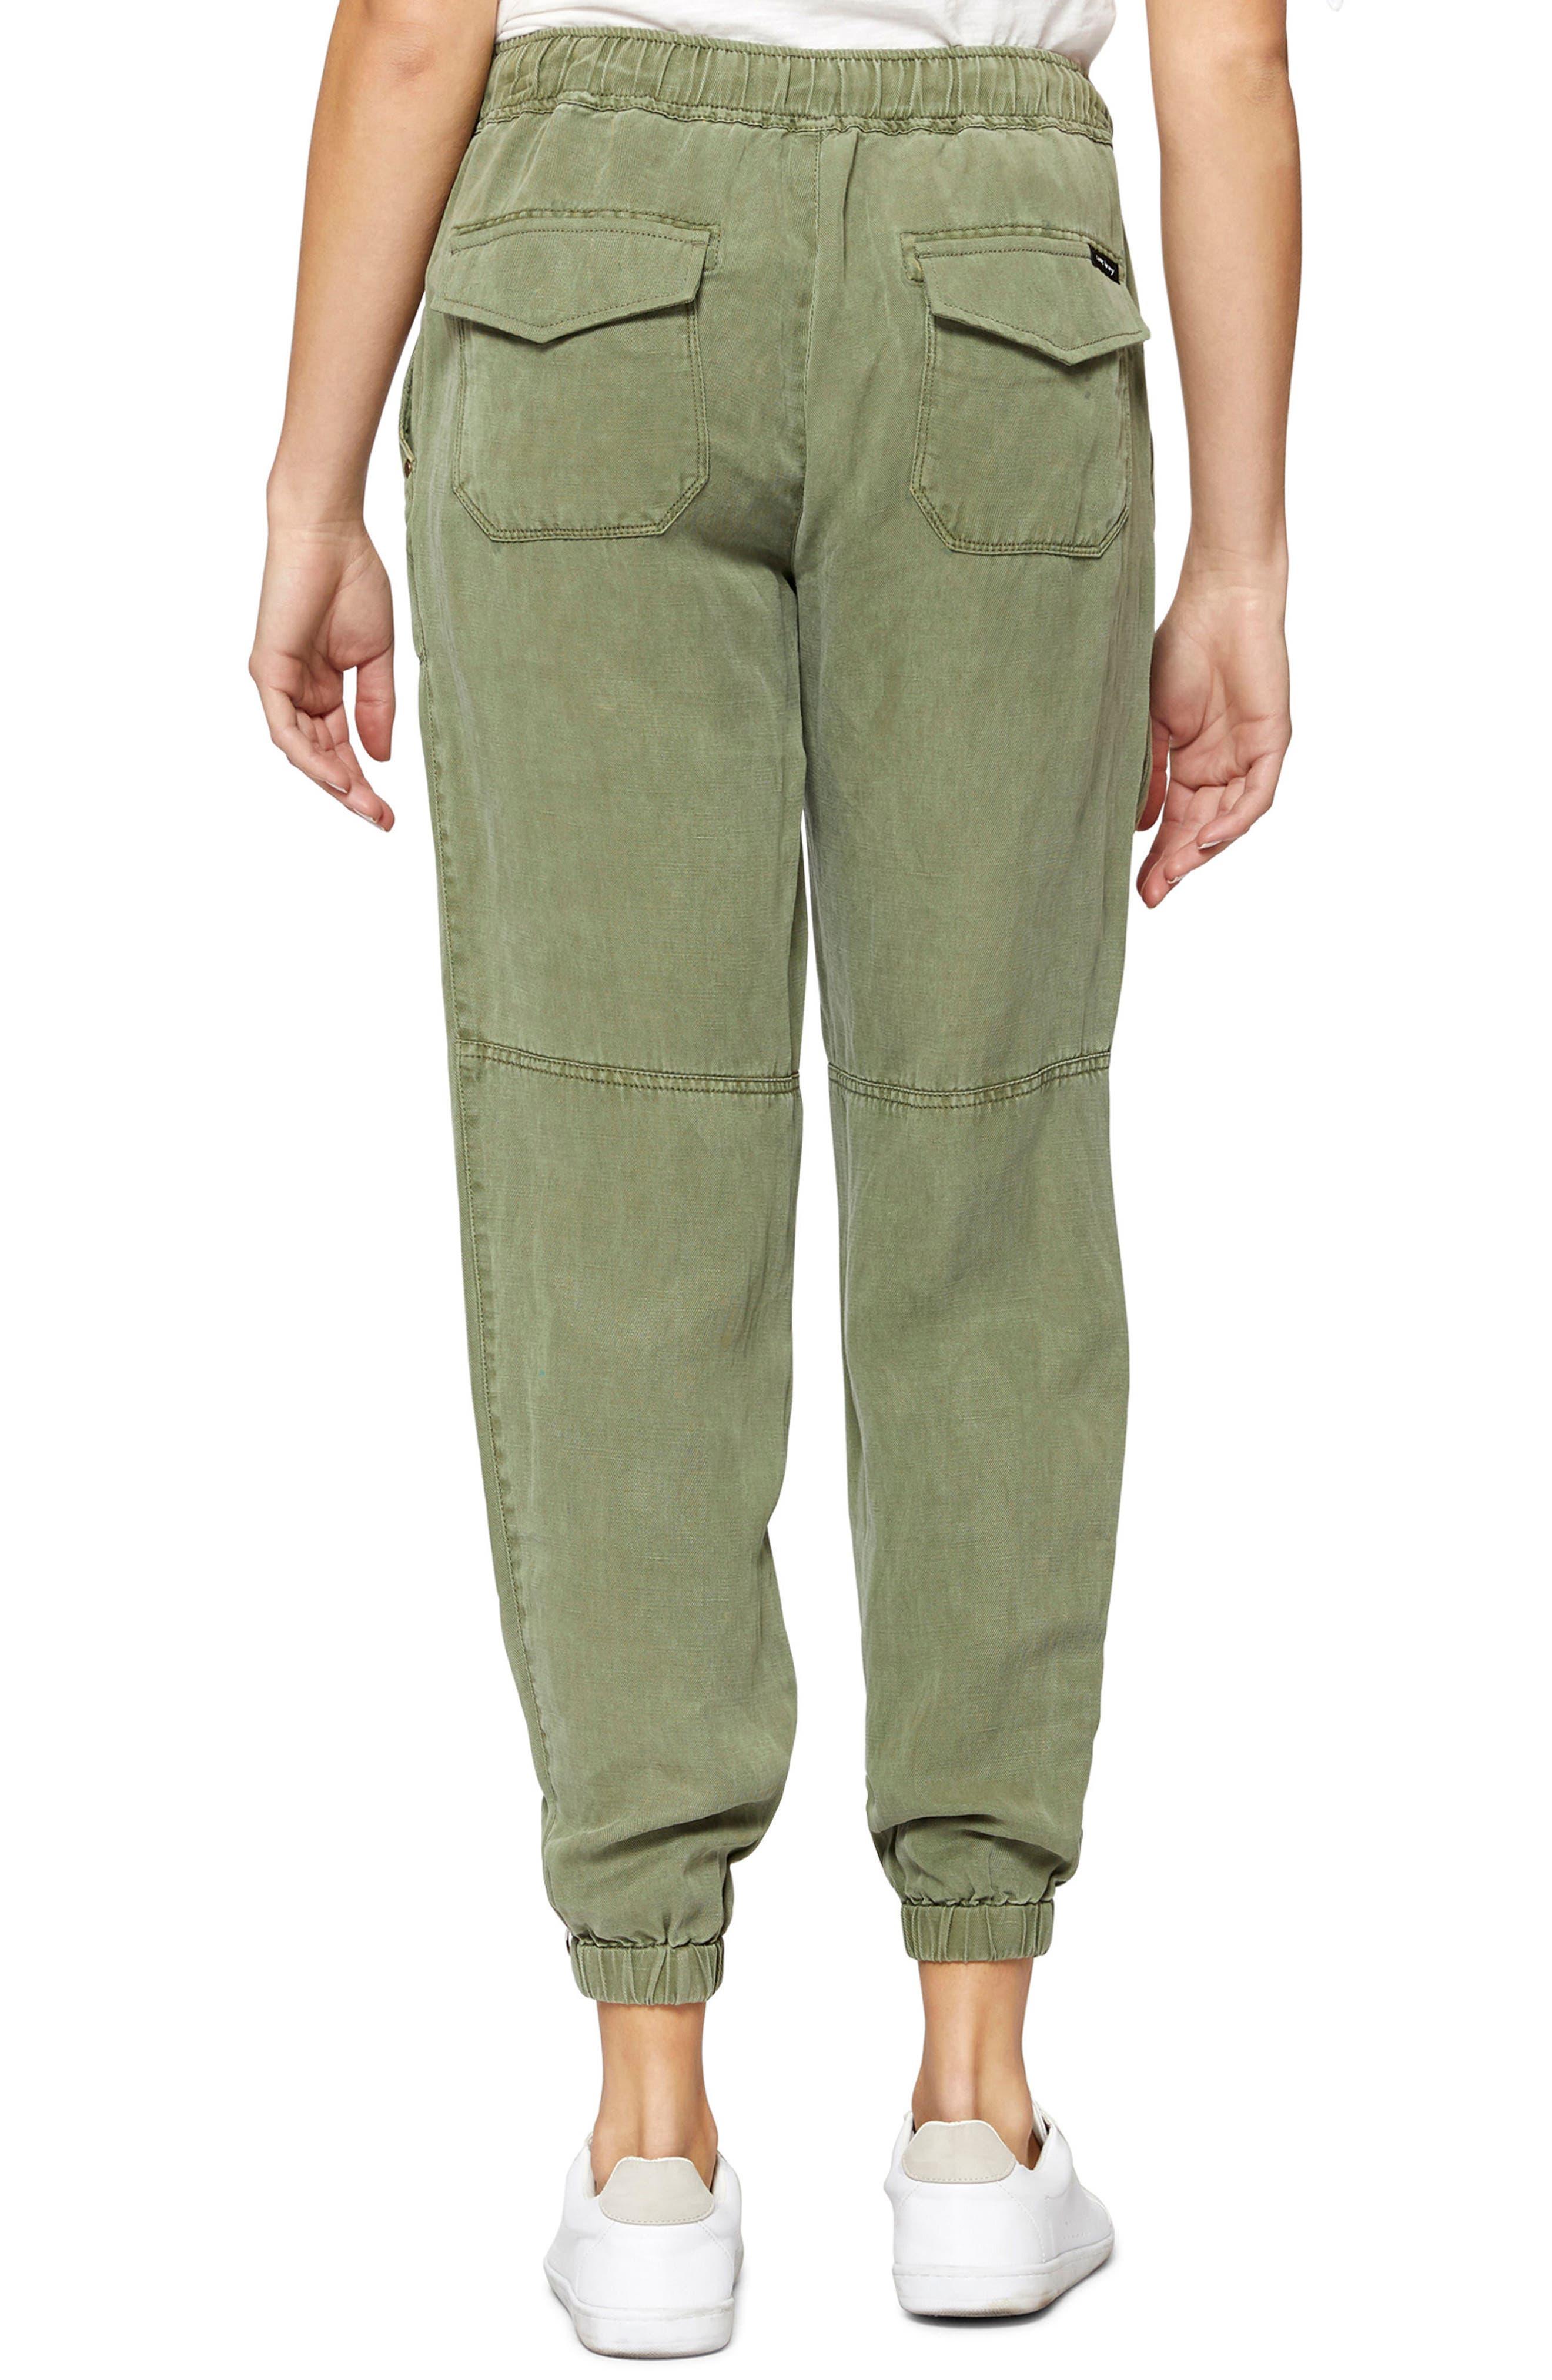 Victory Jogger Linen Blend Pants,                             Alternate thumbnail 2, color,                             Cadet